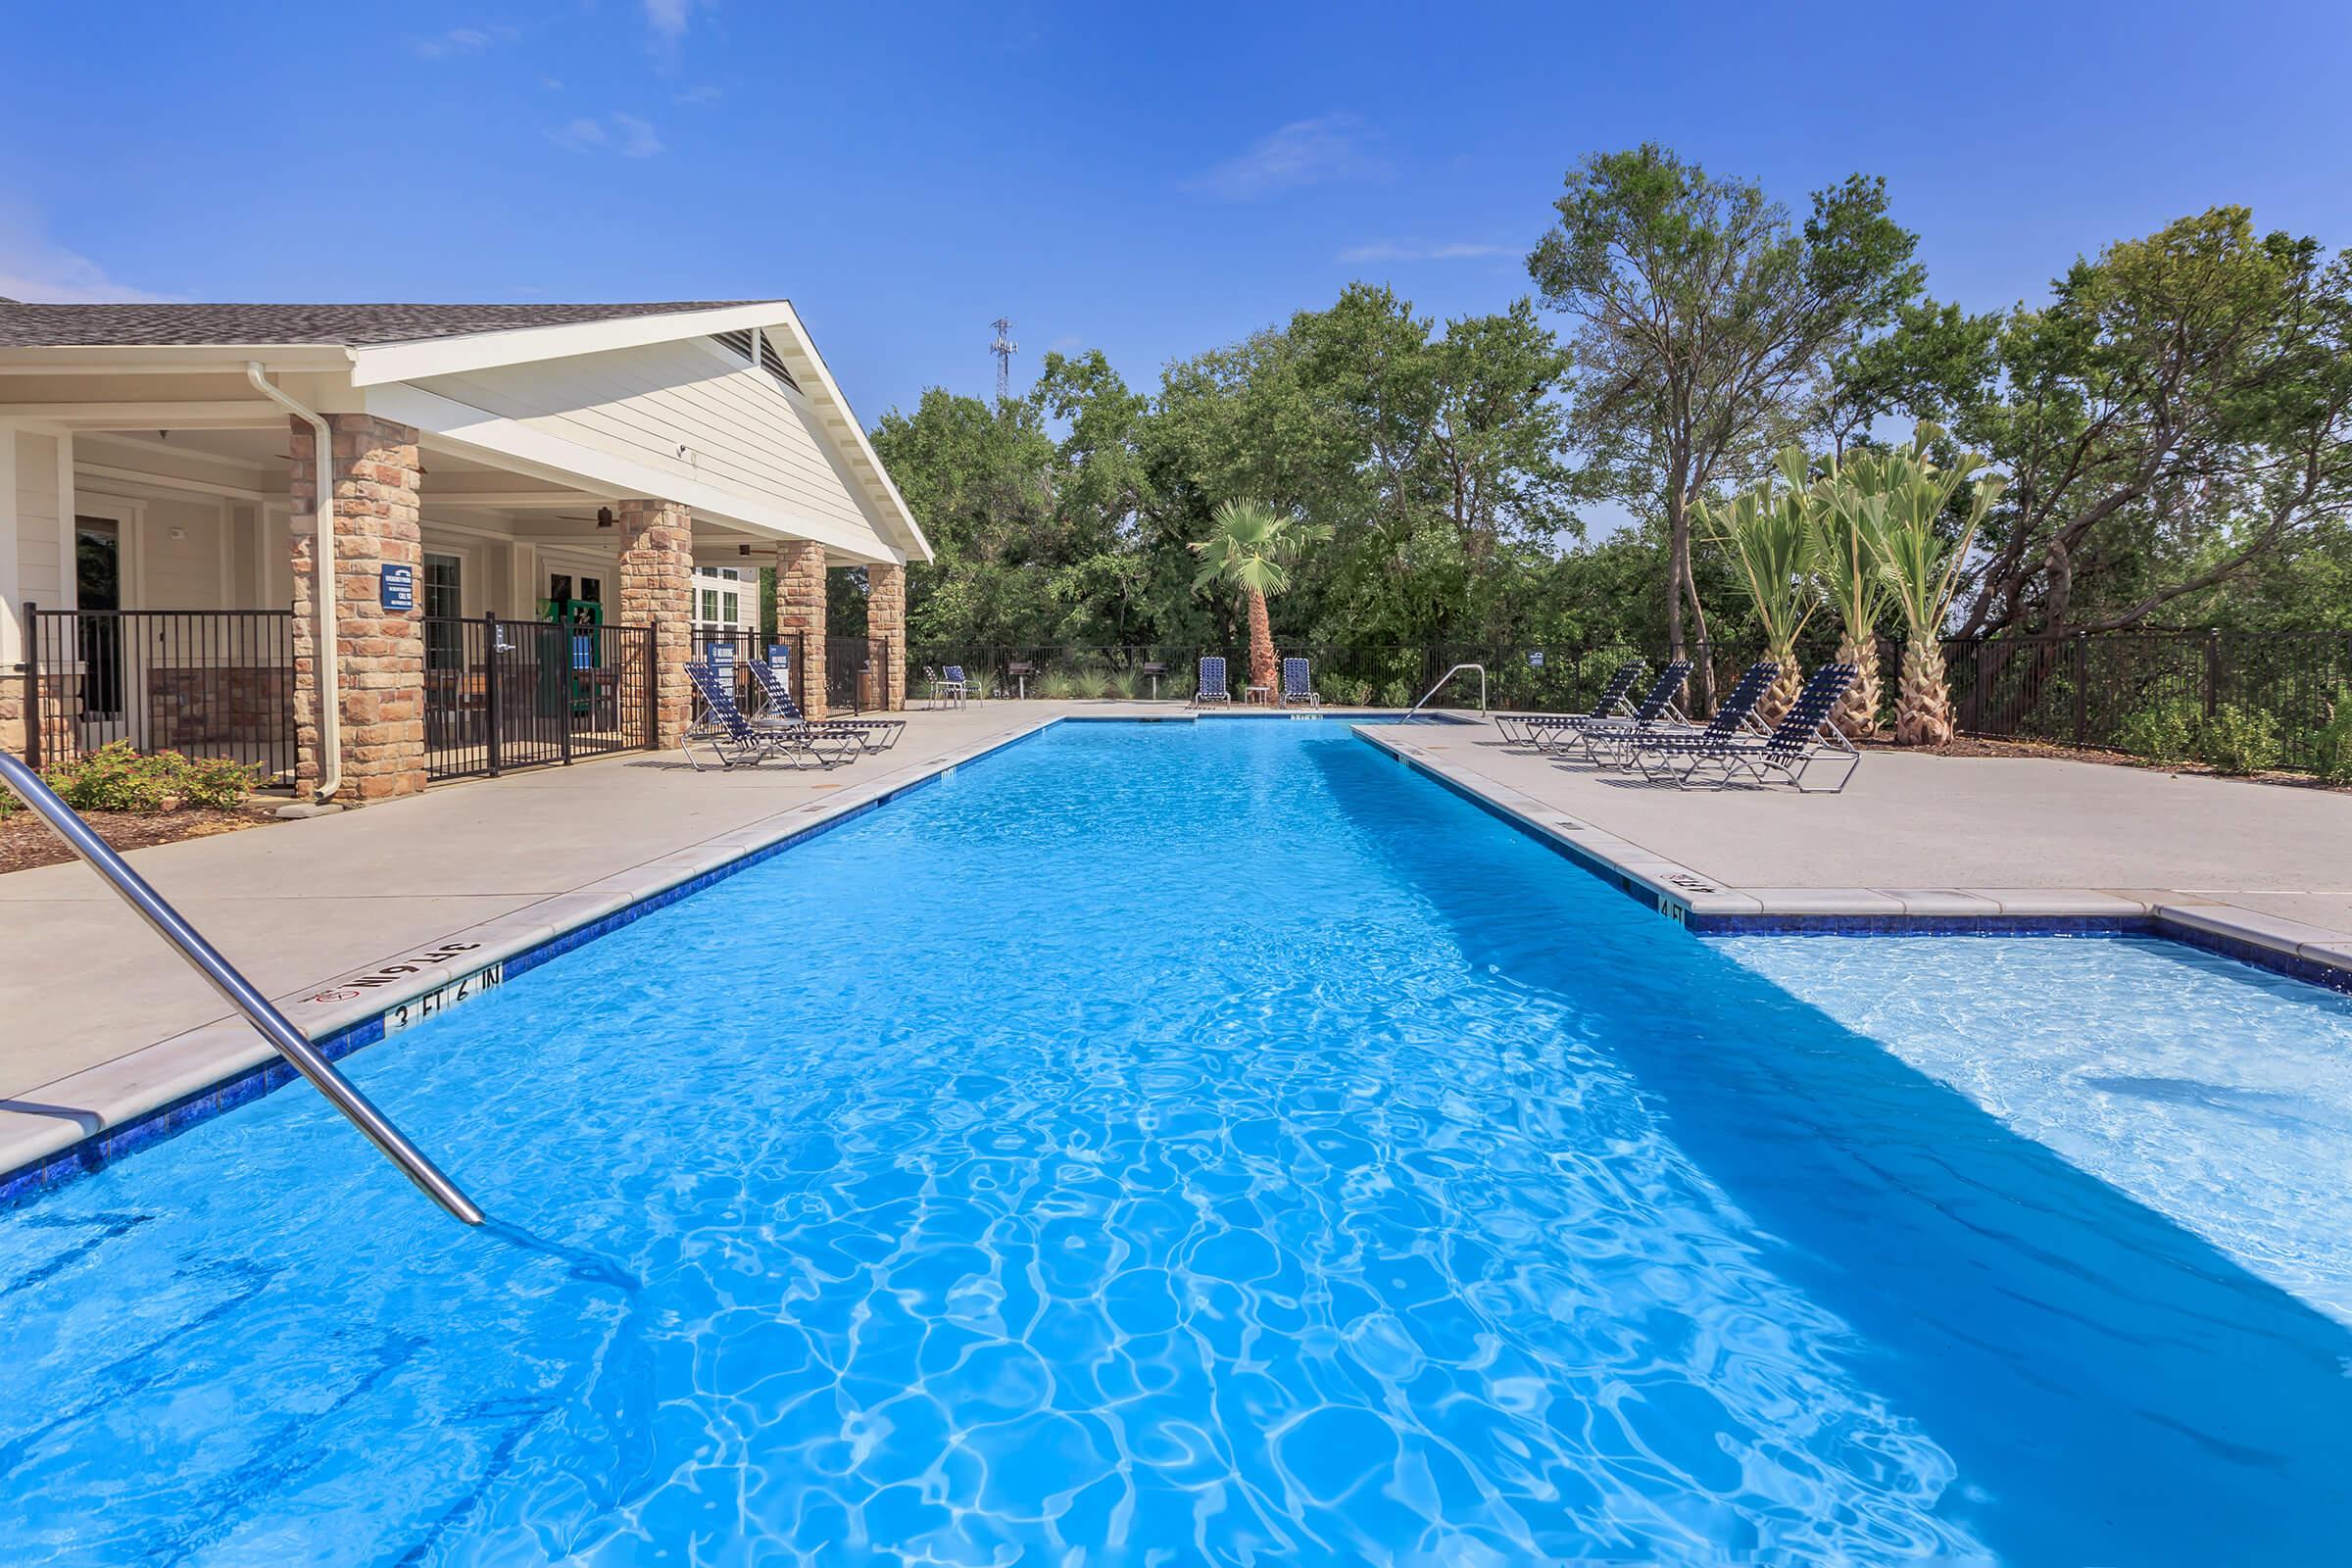 Image of Parkdale Villas in Denison, Texas